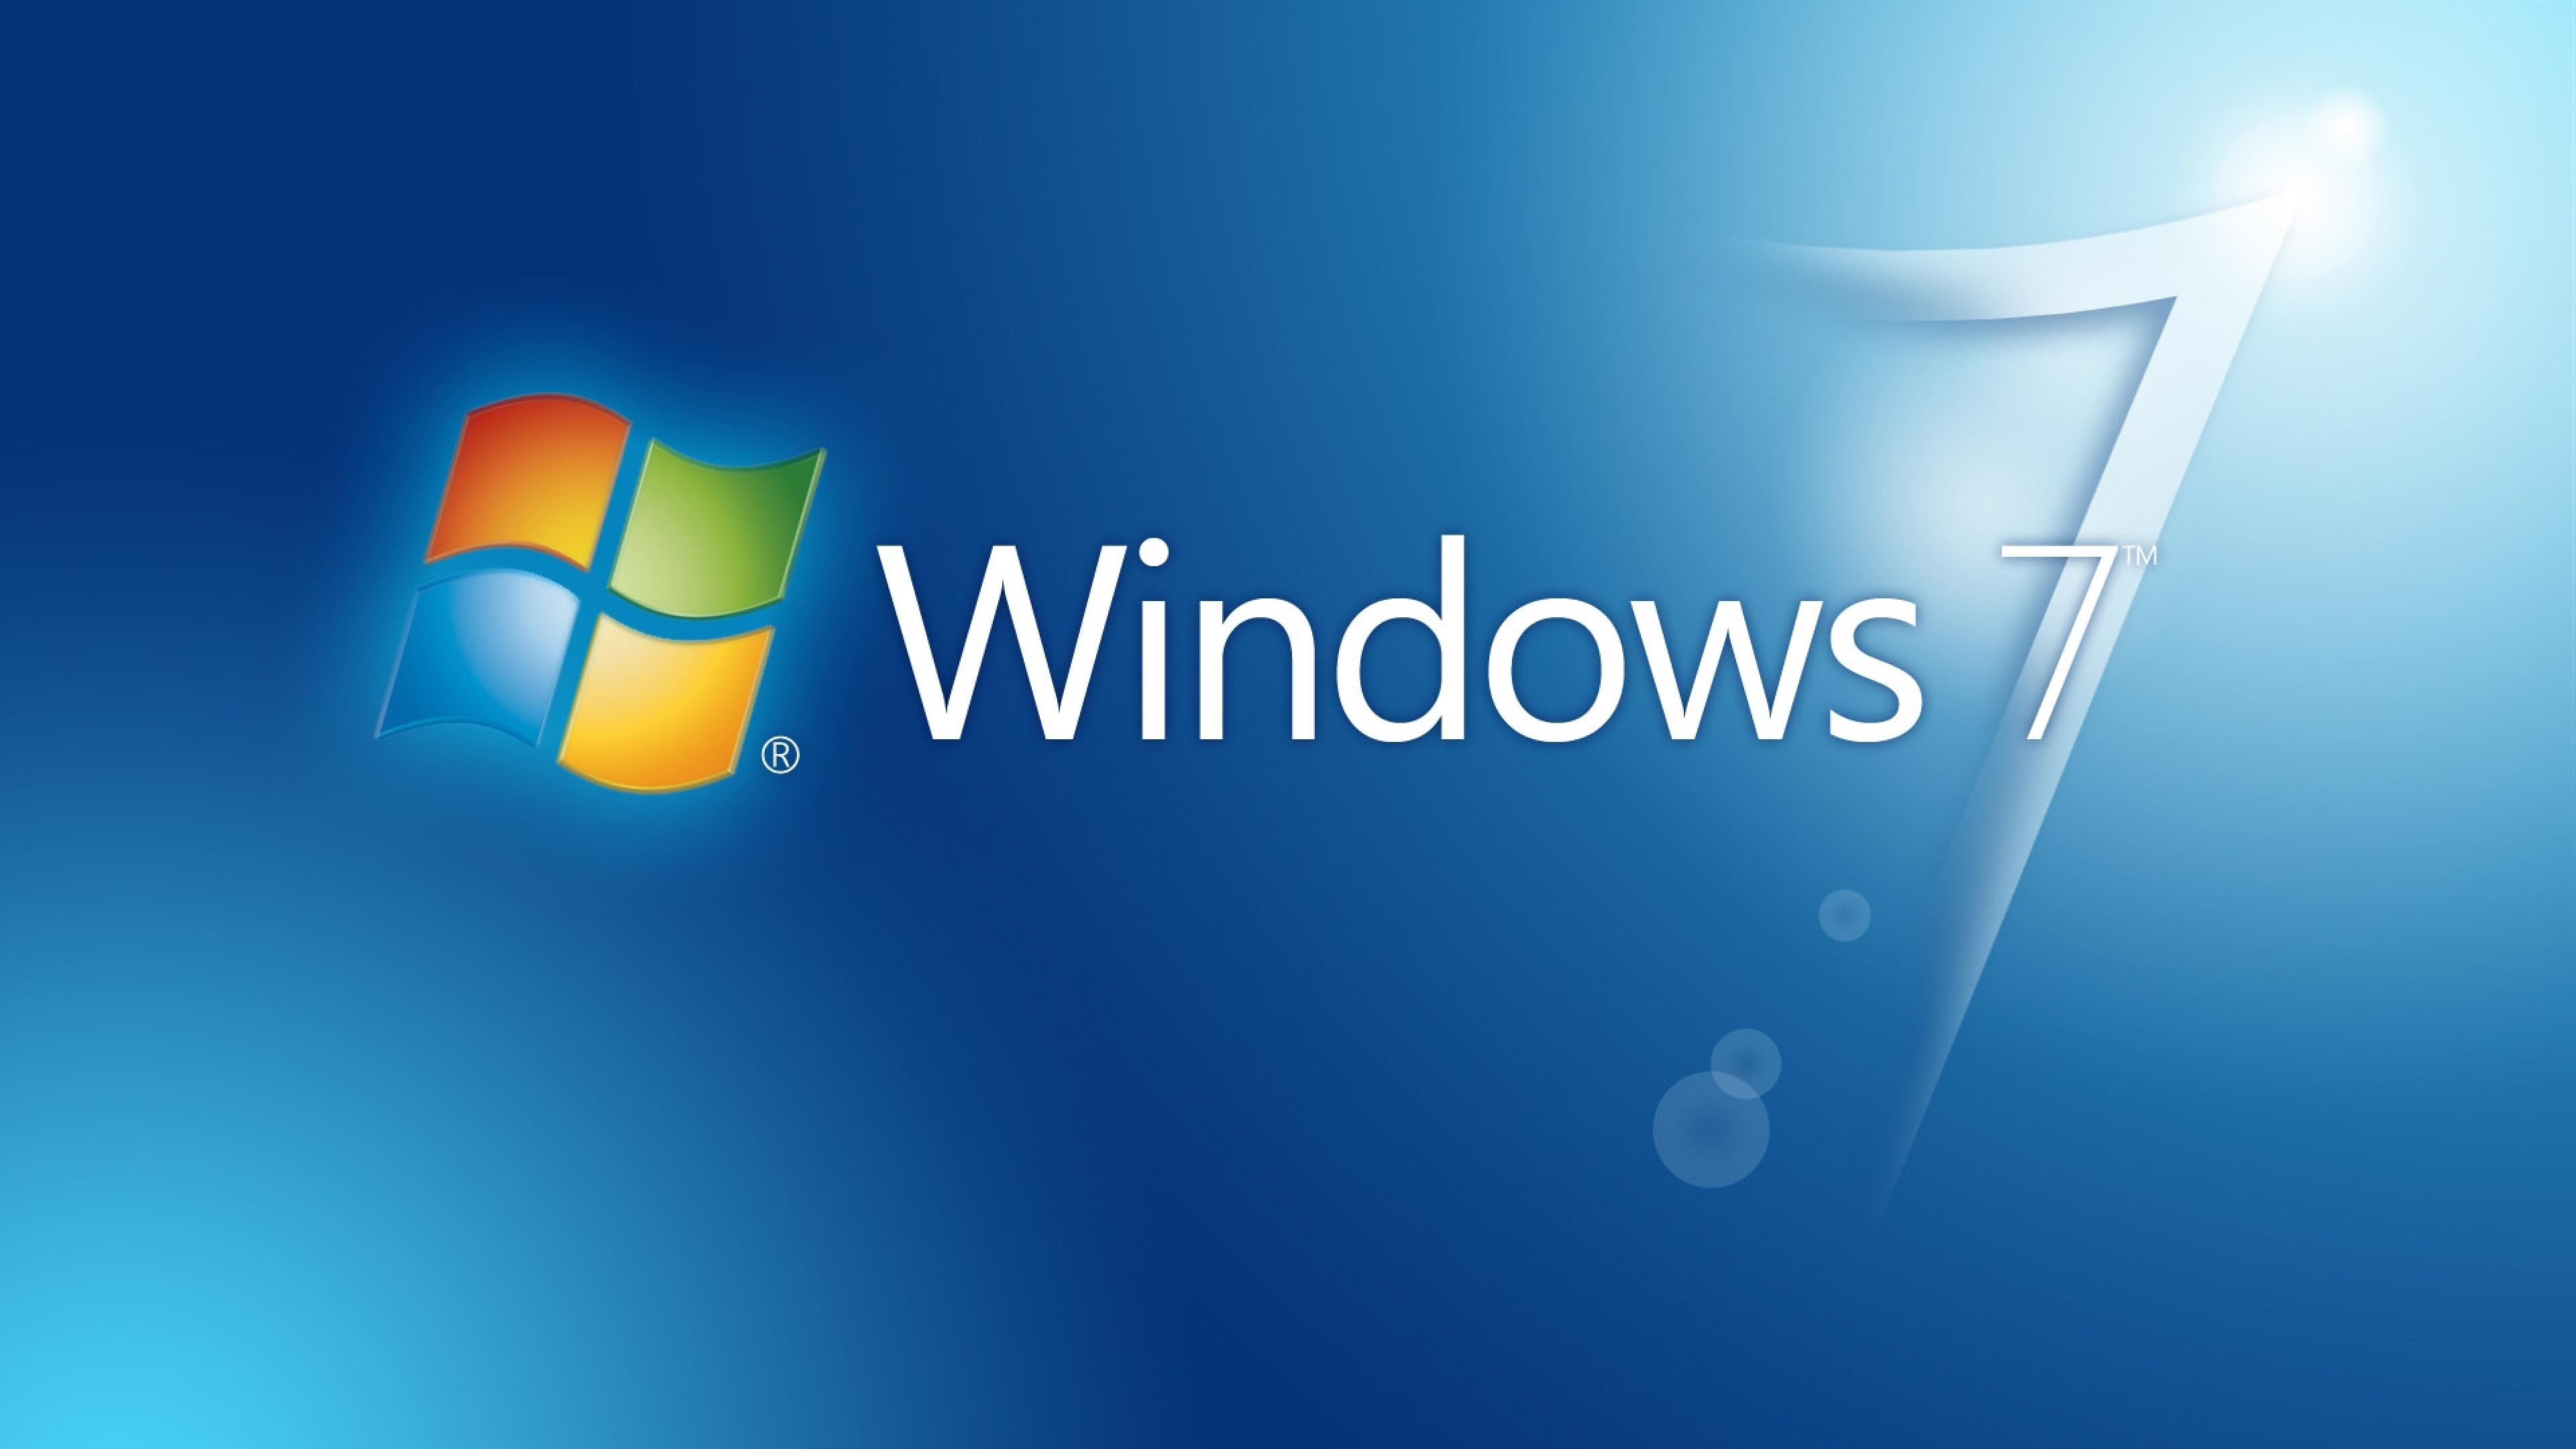 Windows 7 Desktop Background 66 images 3840x2160